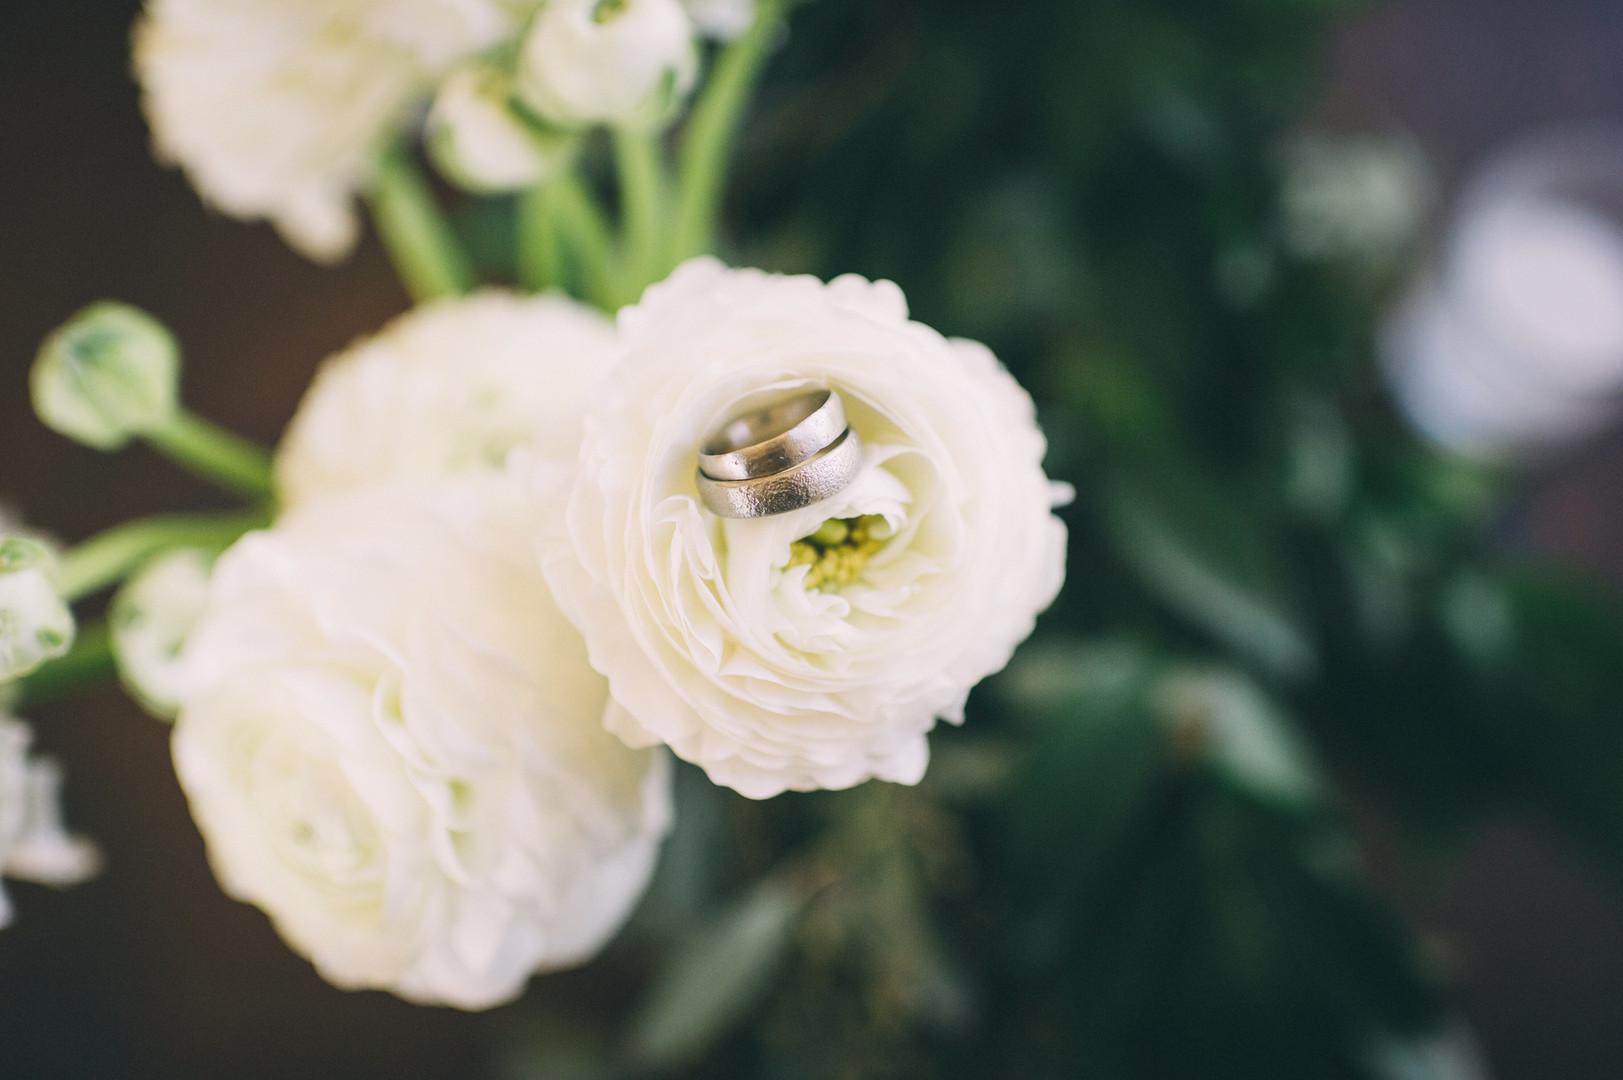 www.santabarbarawedding.com | Sarah Katherine Davis Photography | Santa Barbara Museum of Natural History | Wild Heart Events | Ella and Louie Floral Studio | White Flowers and Rings